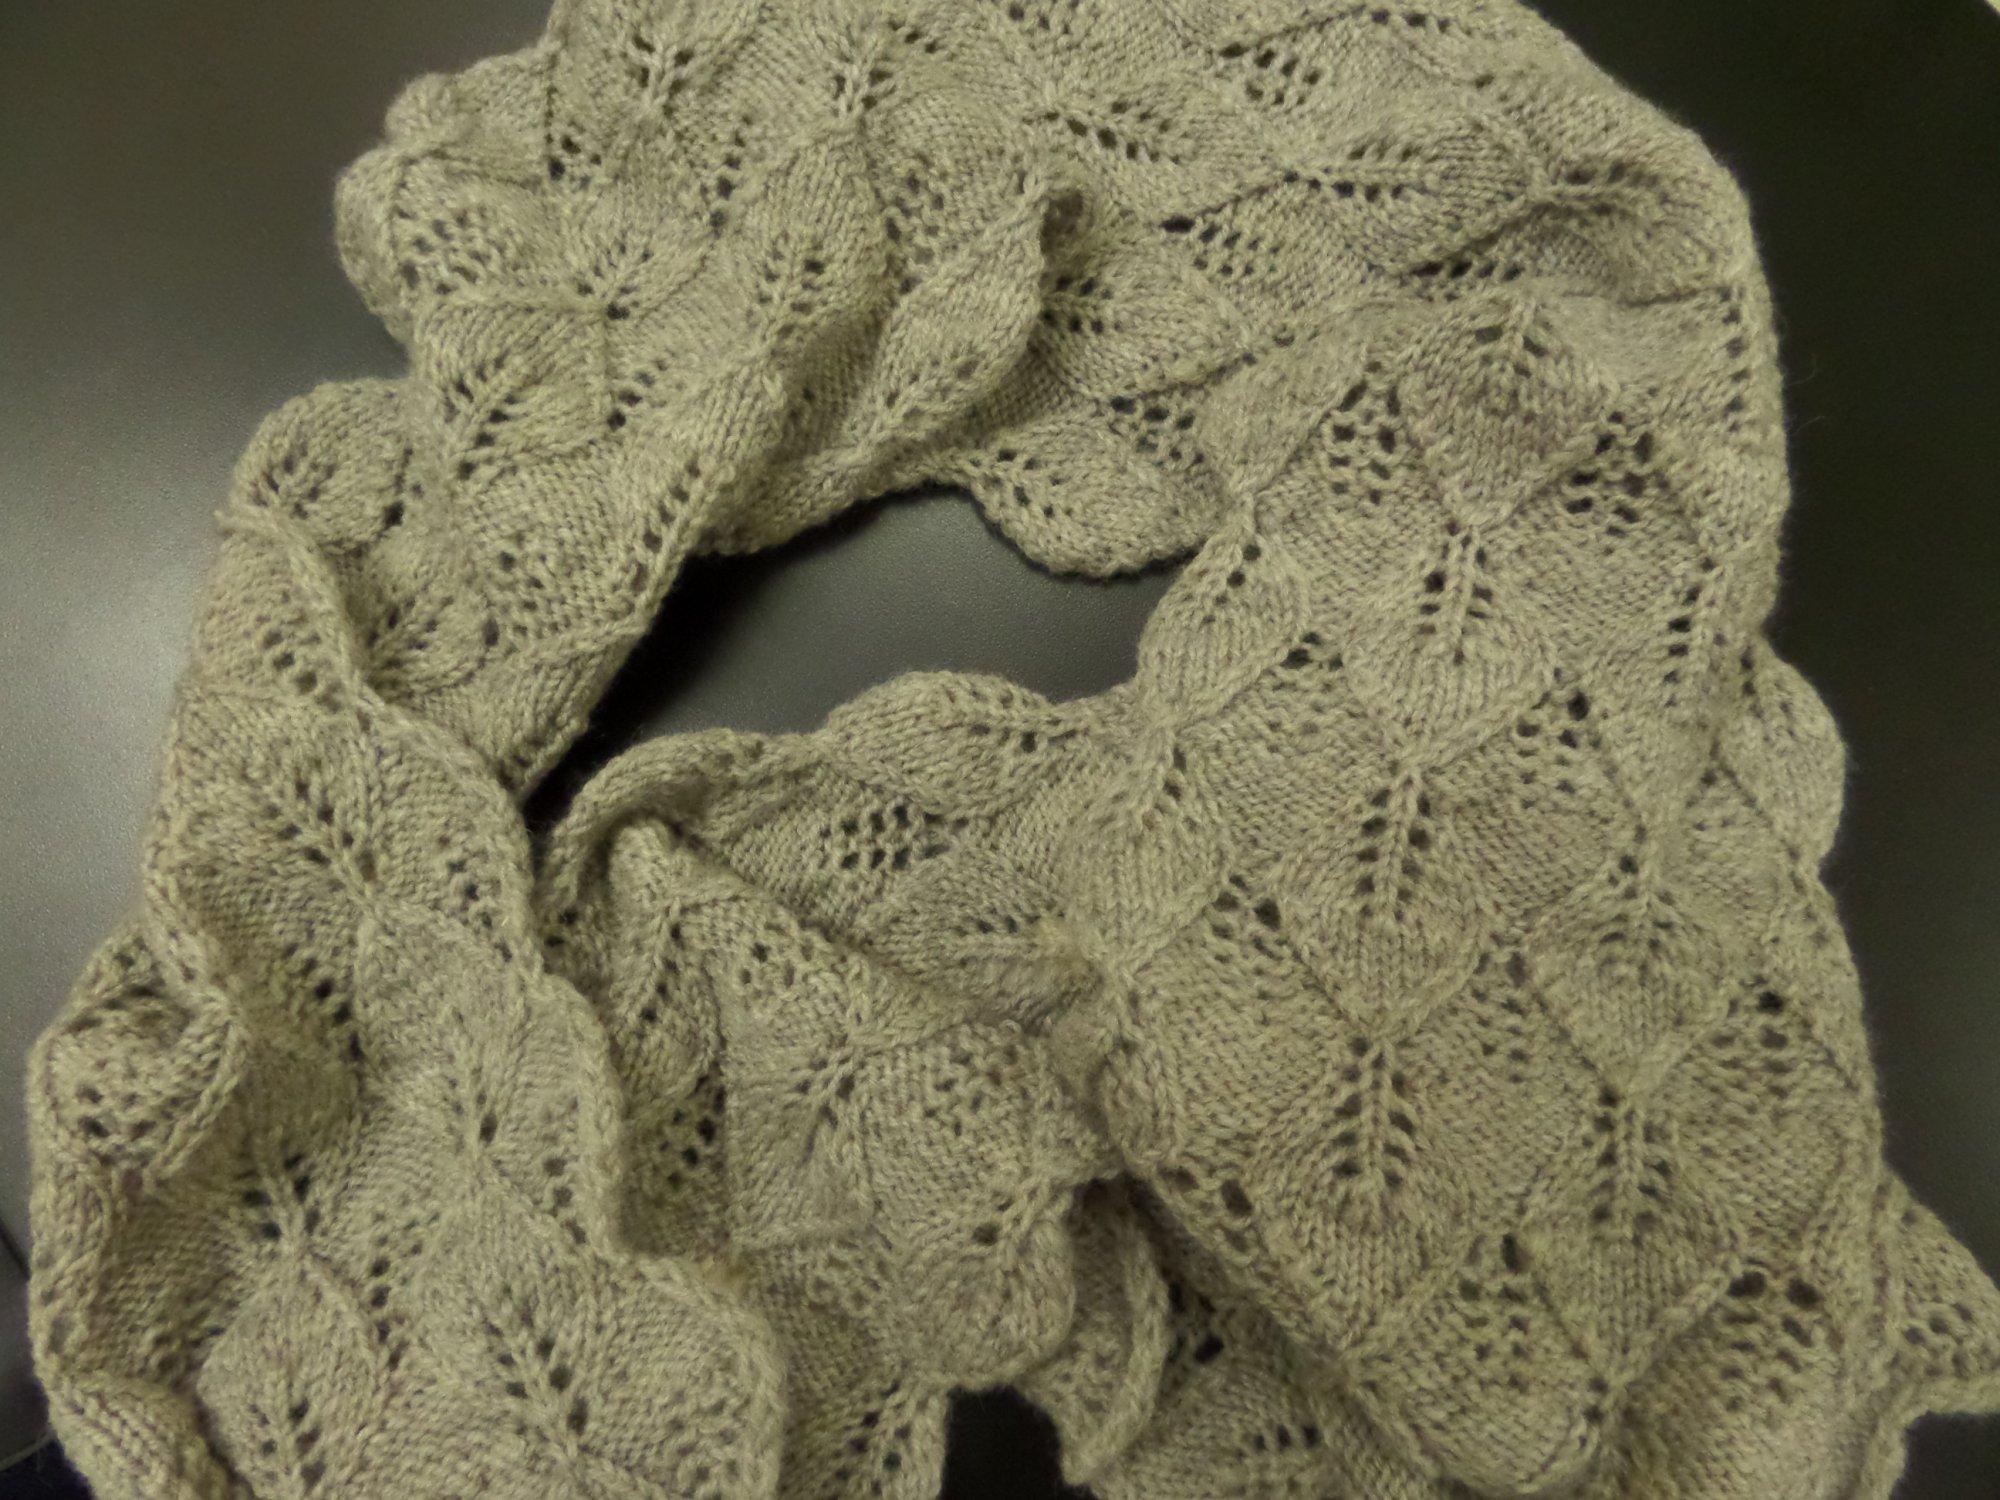 Mohawk Wool Leaf scarf model from Classic Elite